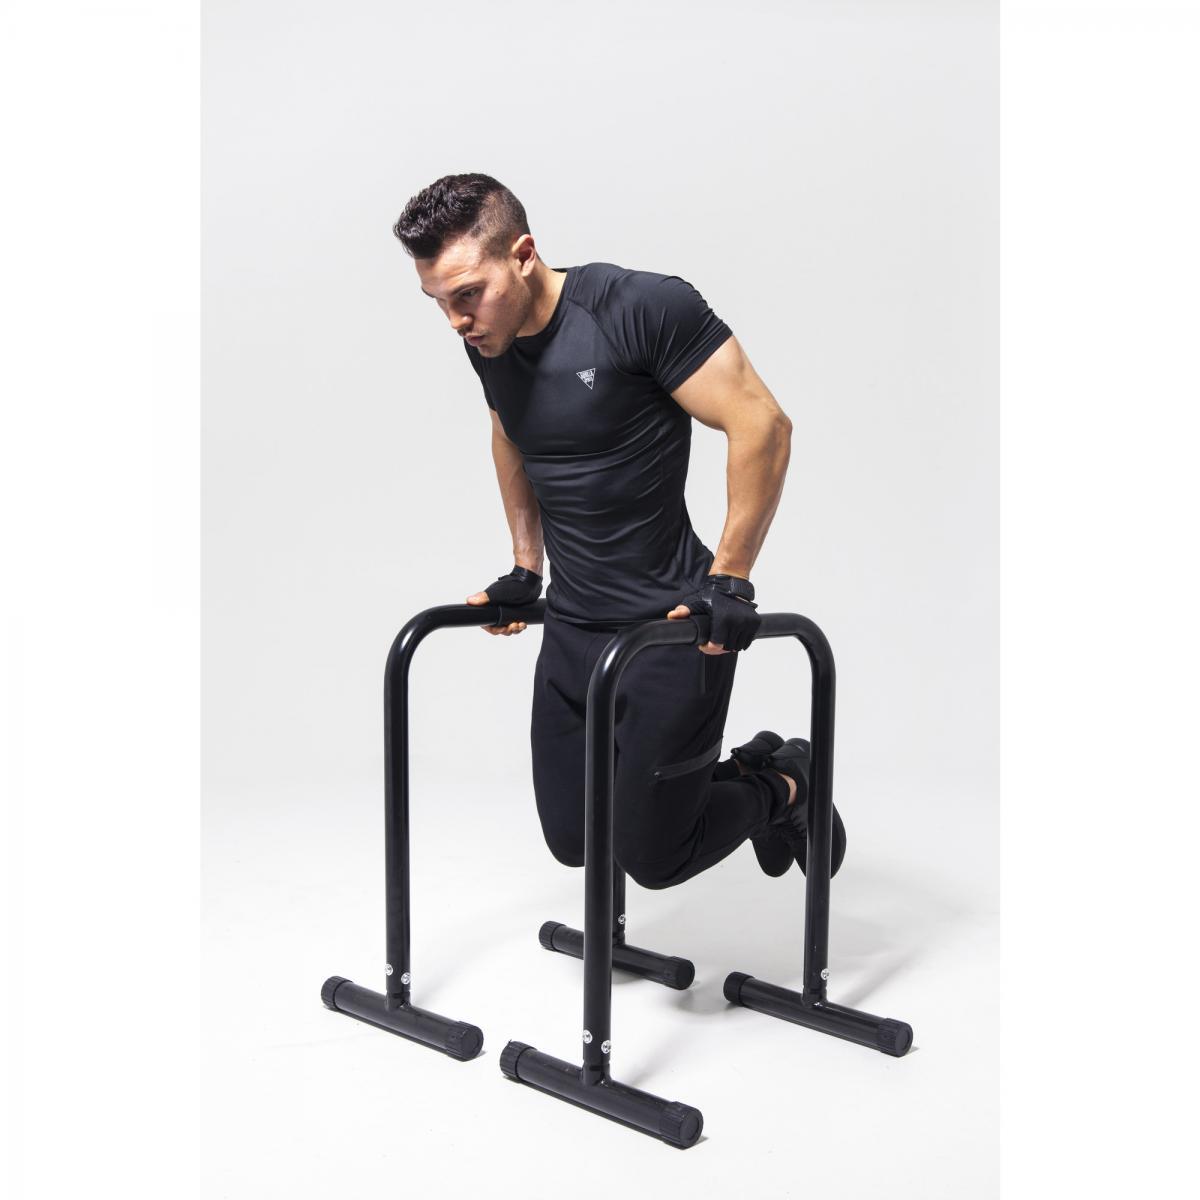 Push-up Stand Bar